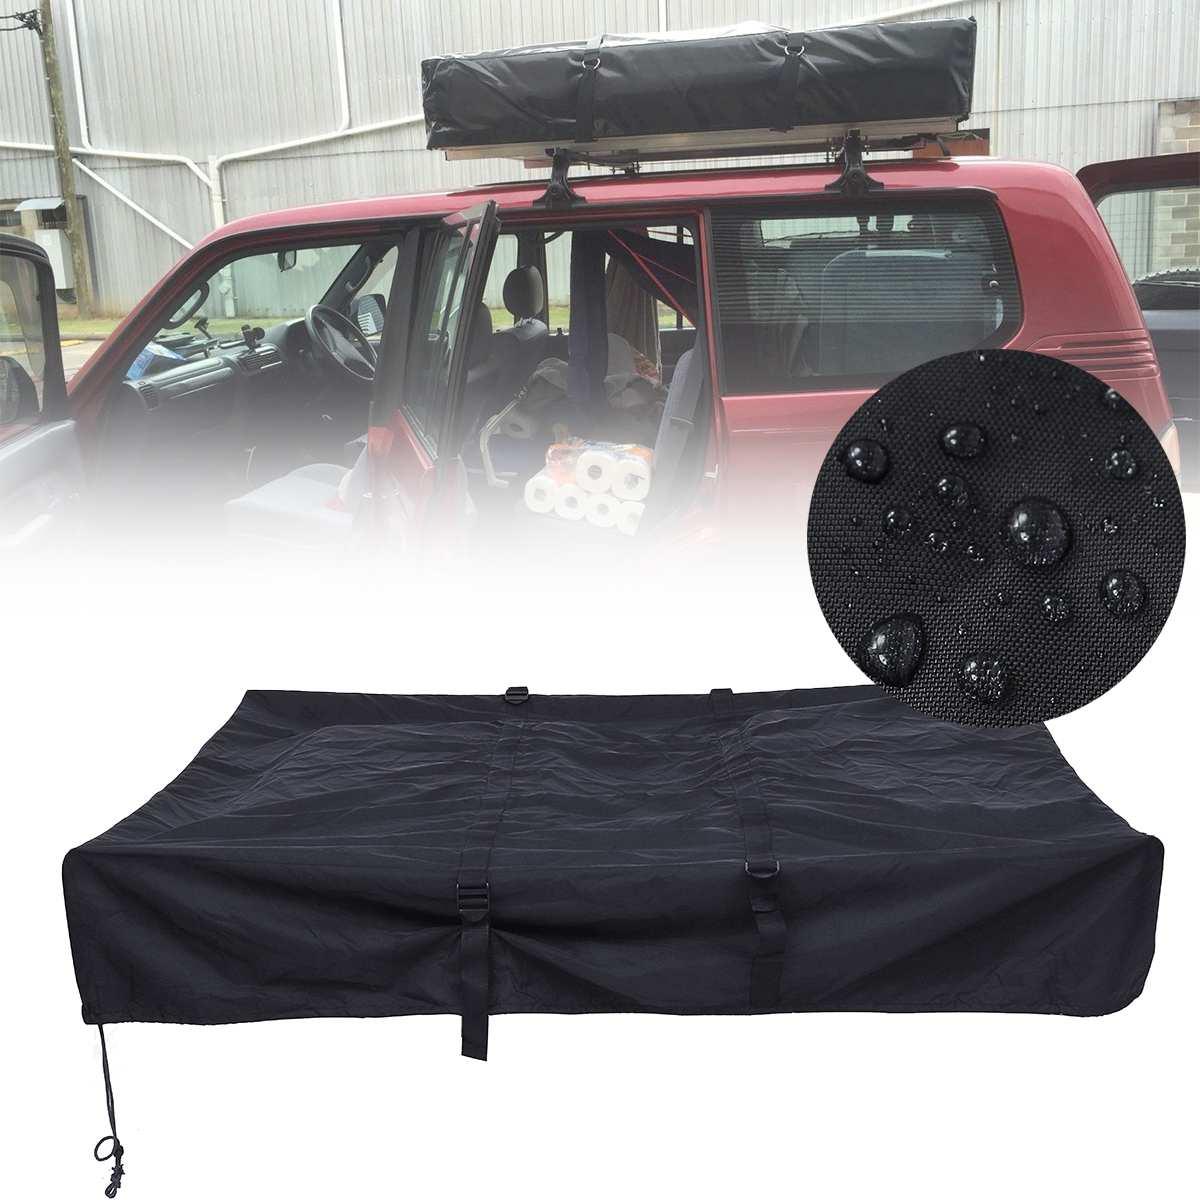 1.4x1.2M-Camper Trailer Travel Cover  Black Rooftop Roof Top Tent Travel Cover-Camper Trailer 4X4 Camping Waterproof